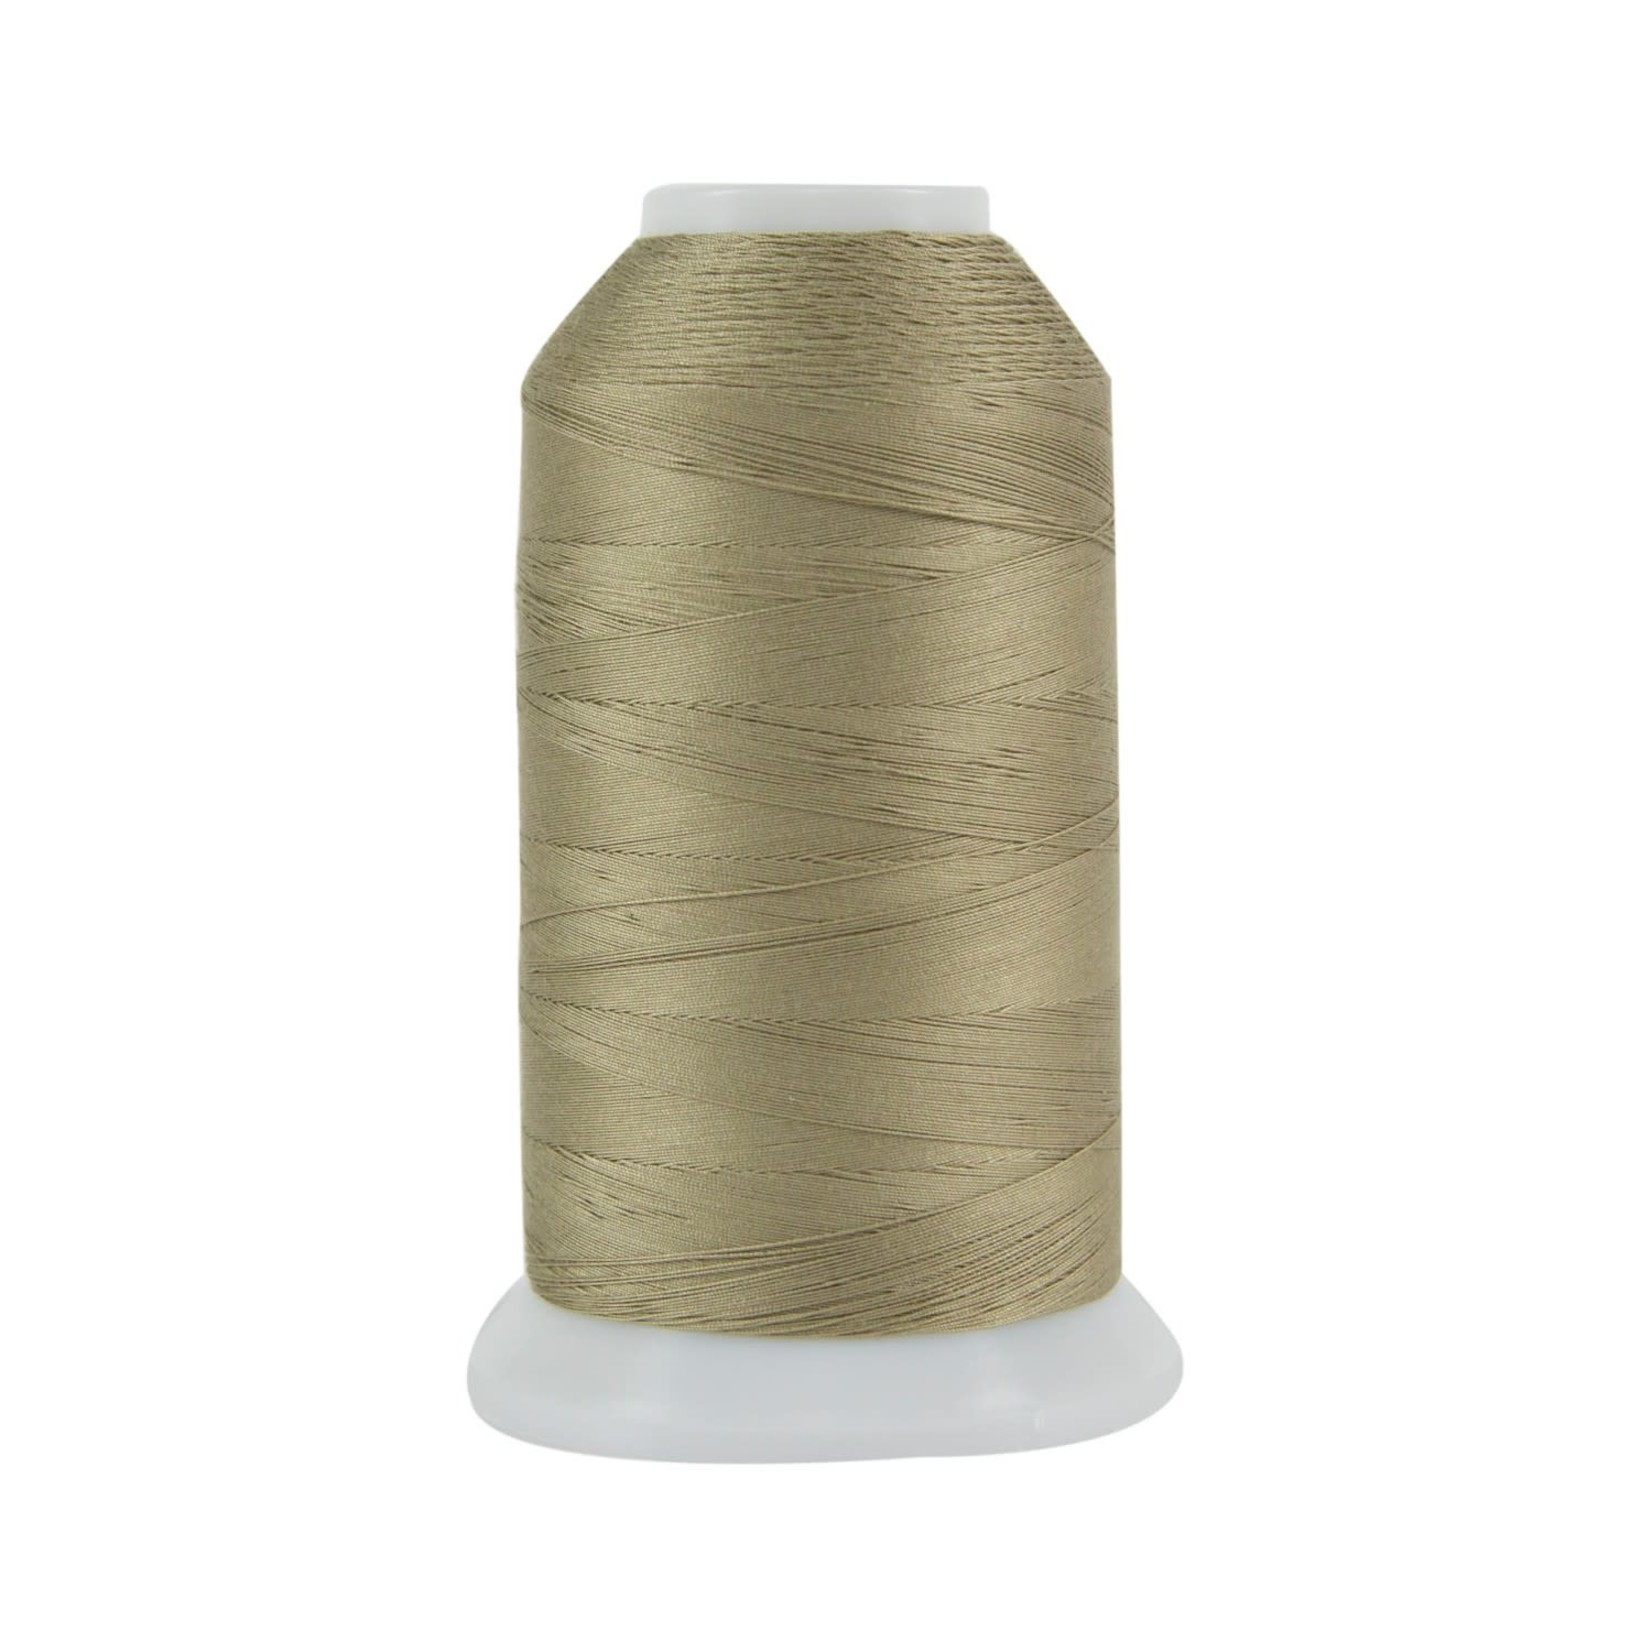 Superior Threads King Tut - #40 - 1828 m - 0974 Bedouin